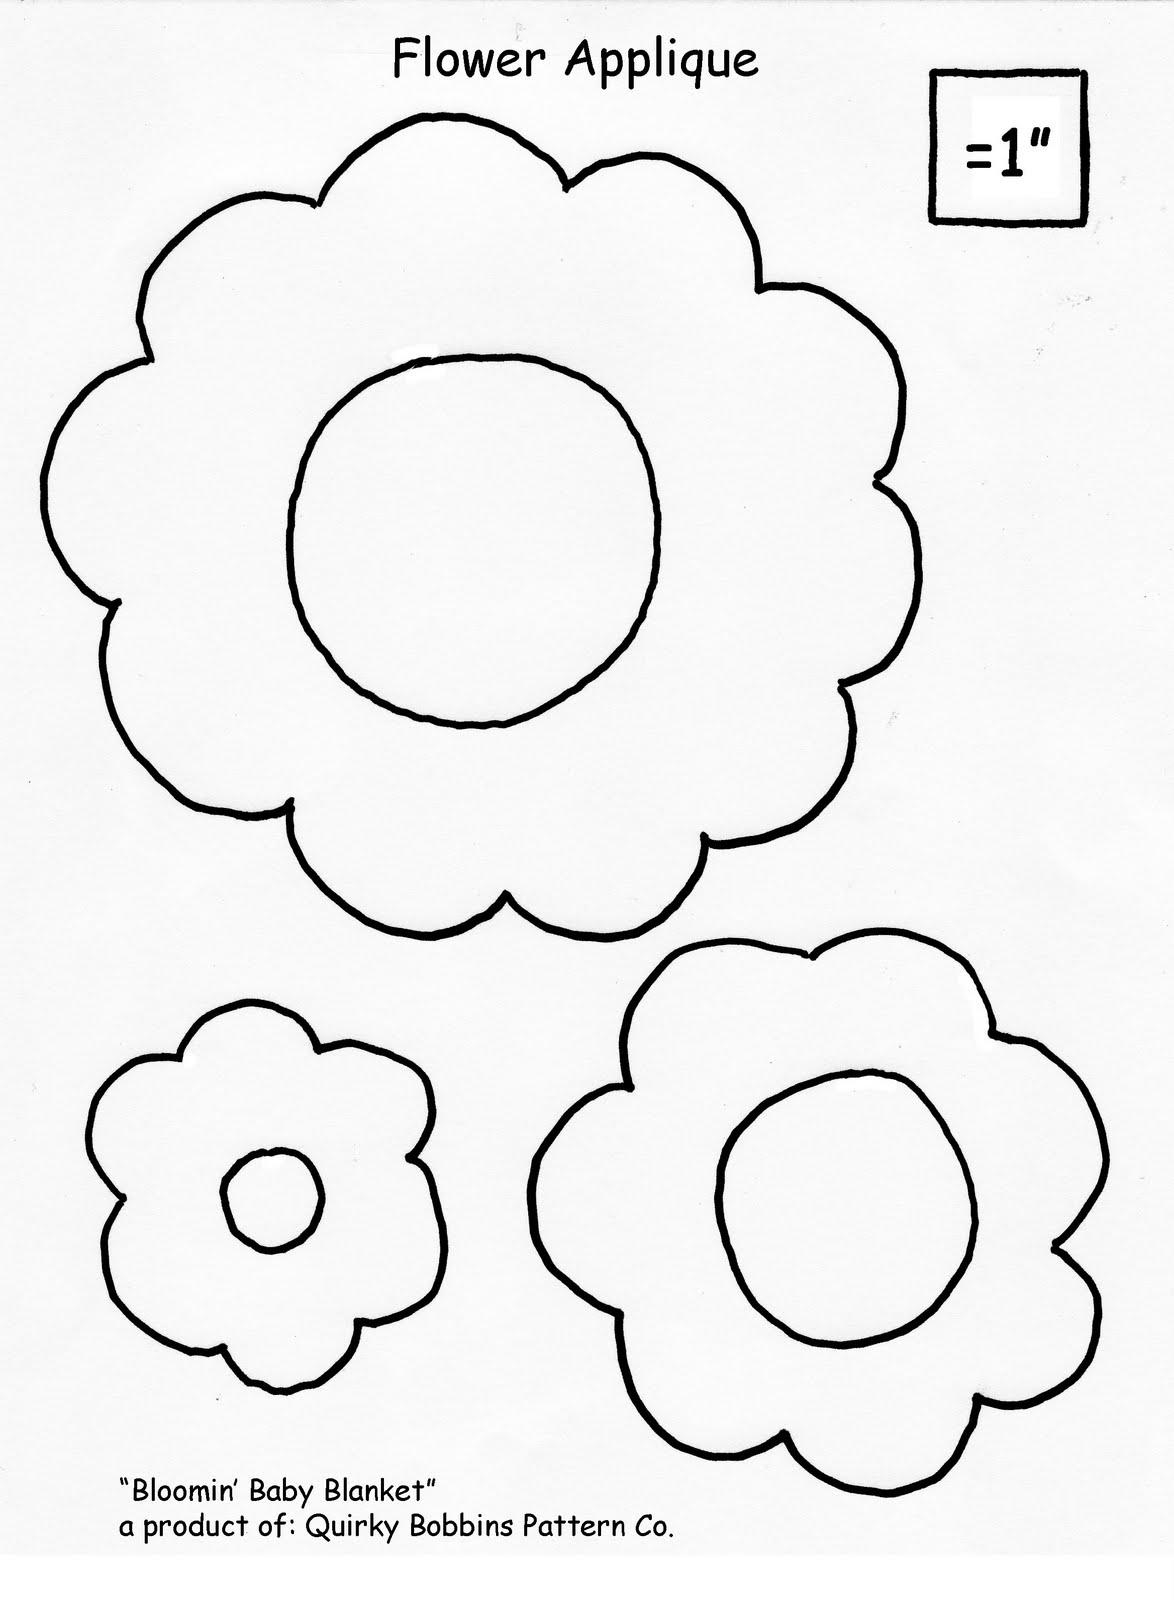 FREE FLORAL APPLIQUE PATTERNS | APPLIQUE : free flower applique patterns for quilts - Adamdwight.com